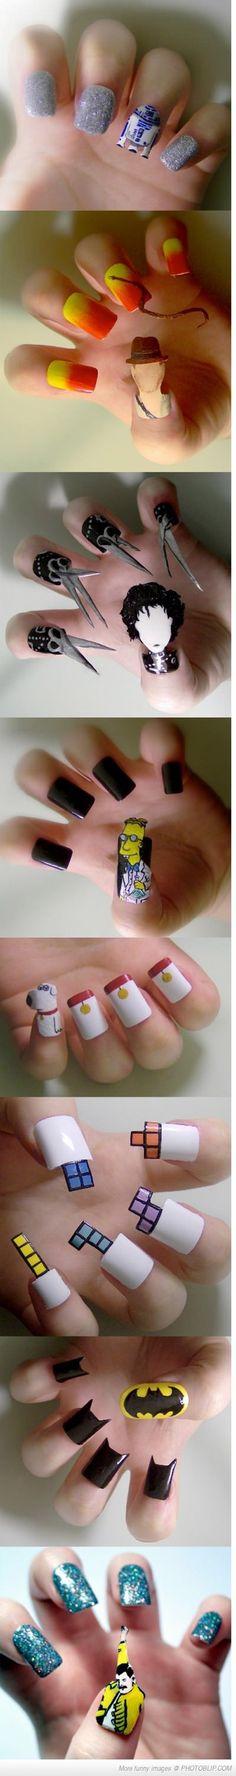 Epic Nail Art